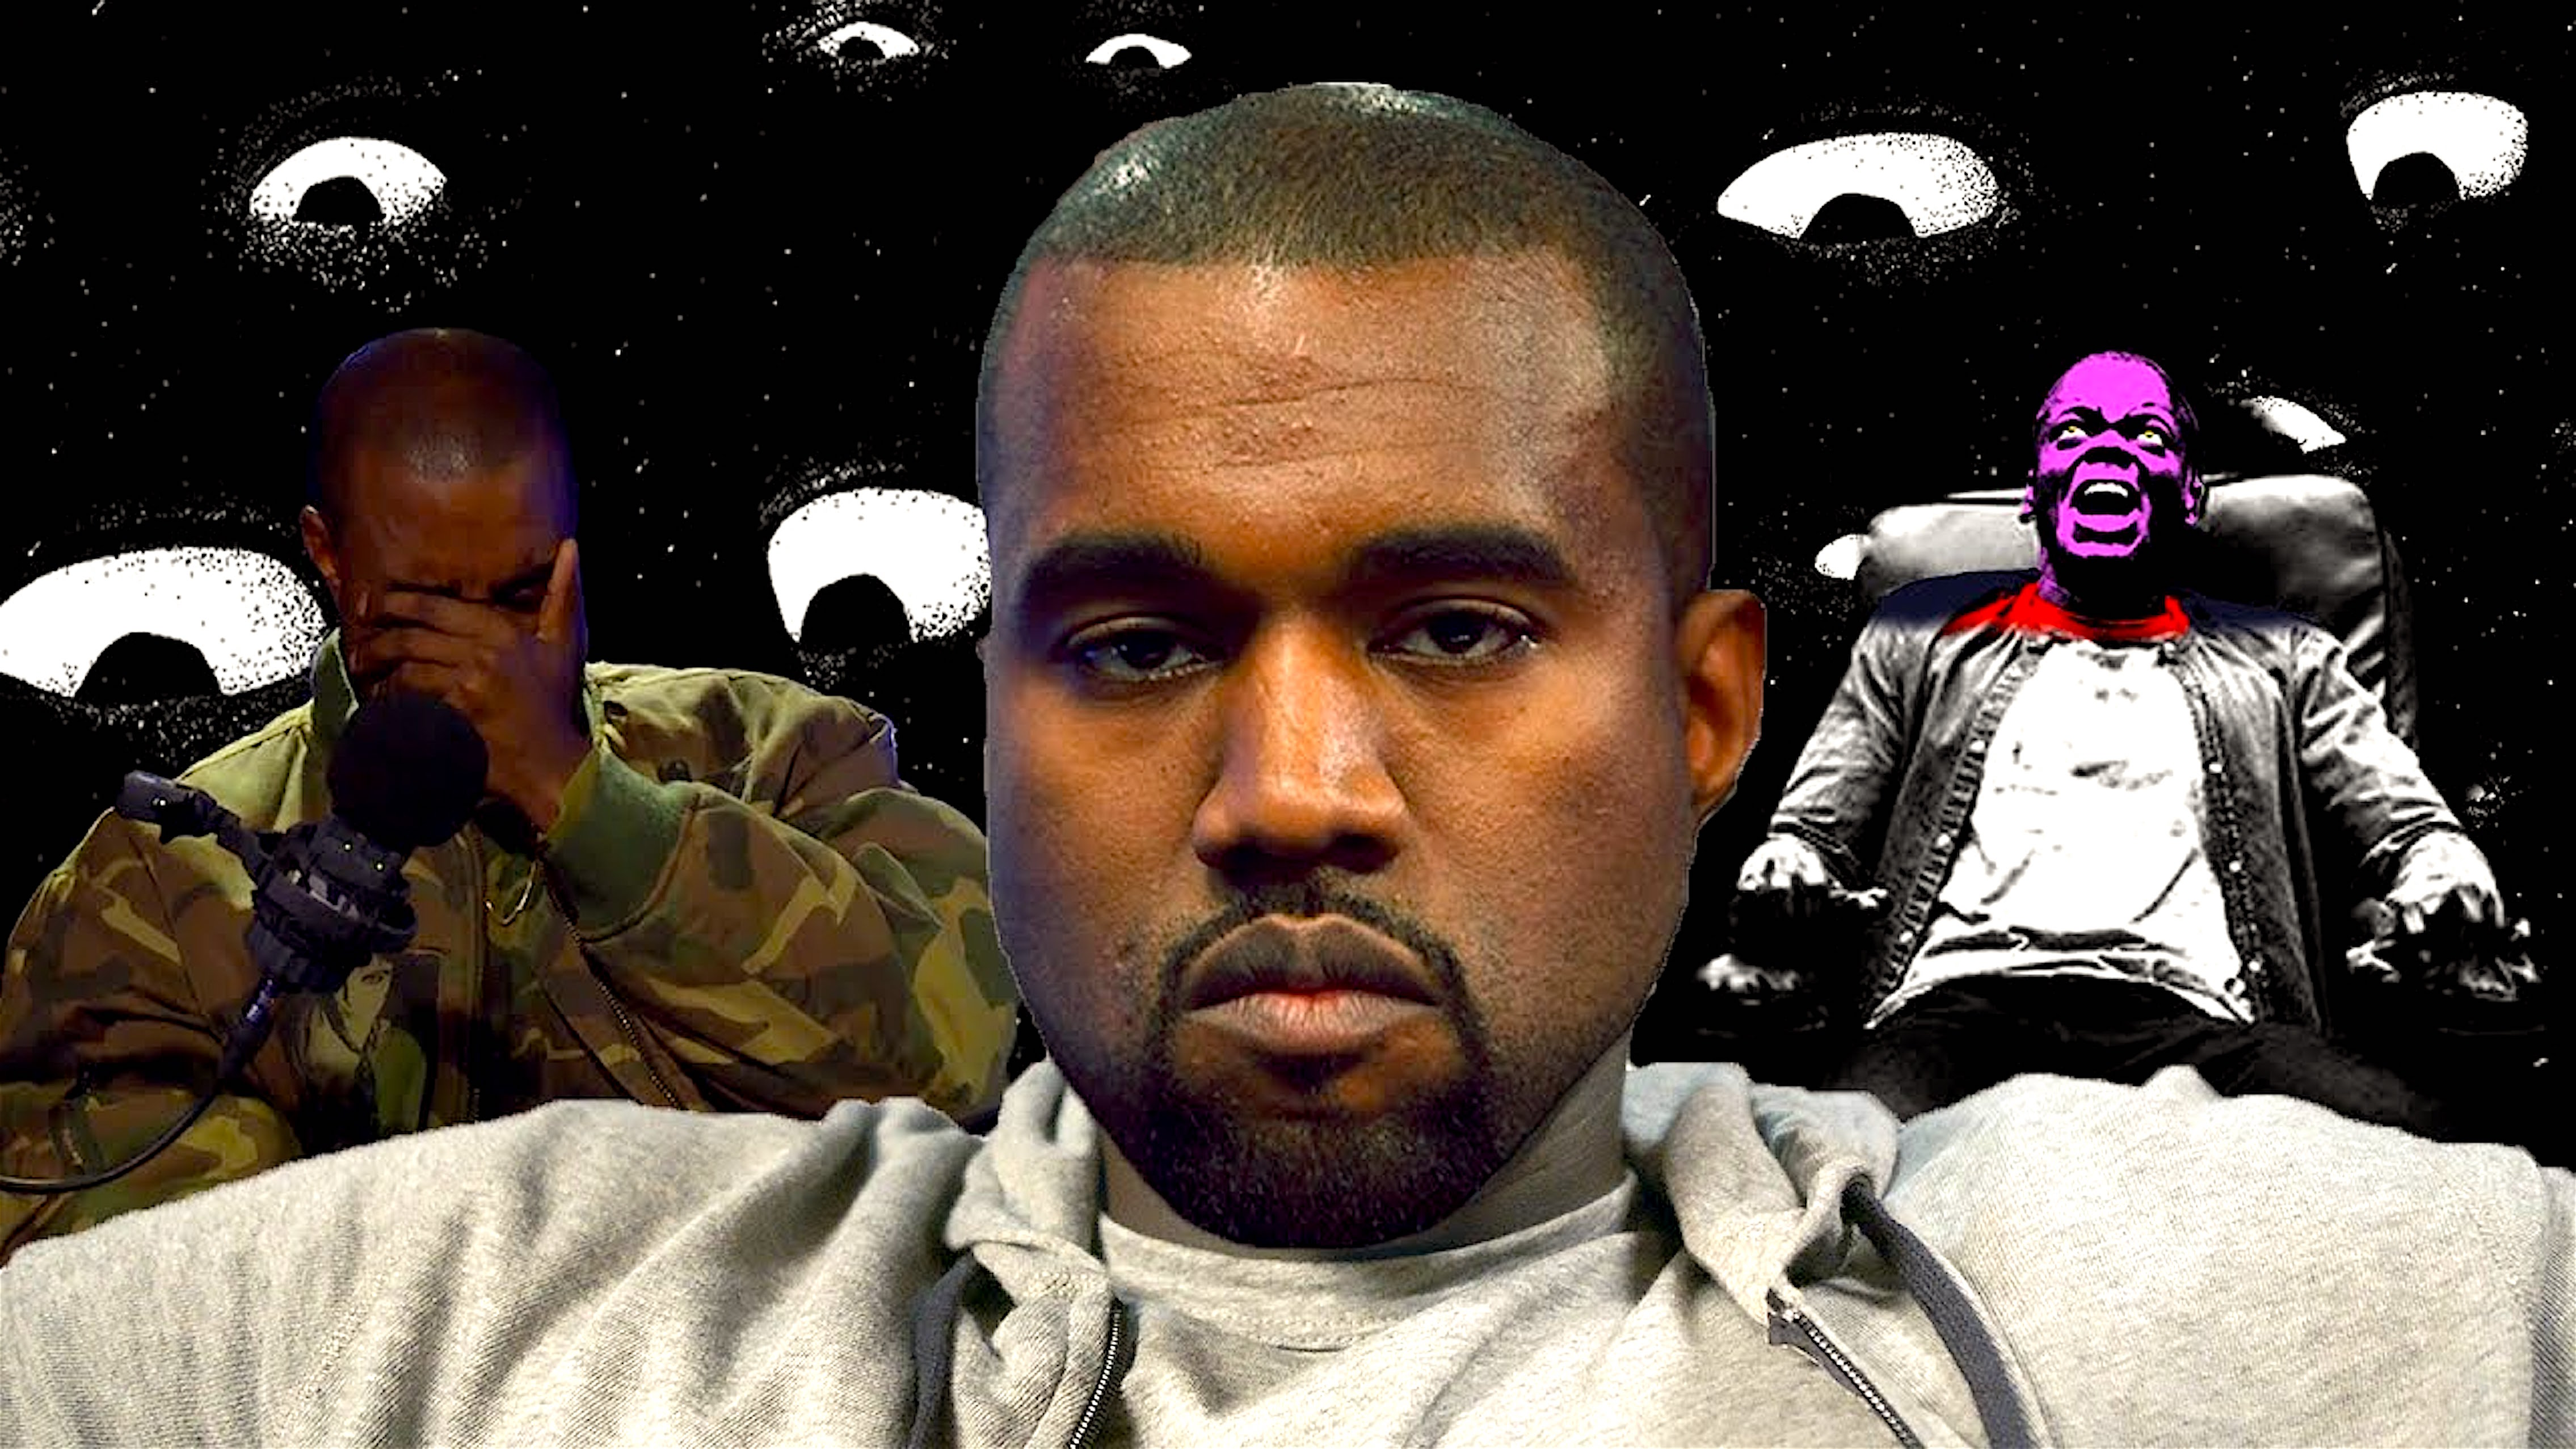 Stranger Than Fiction – Kanye 'Get Out' West | Behind The Meltdown